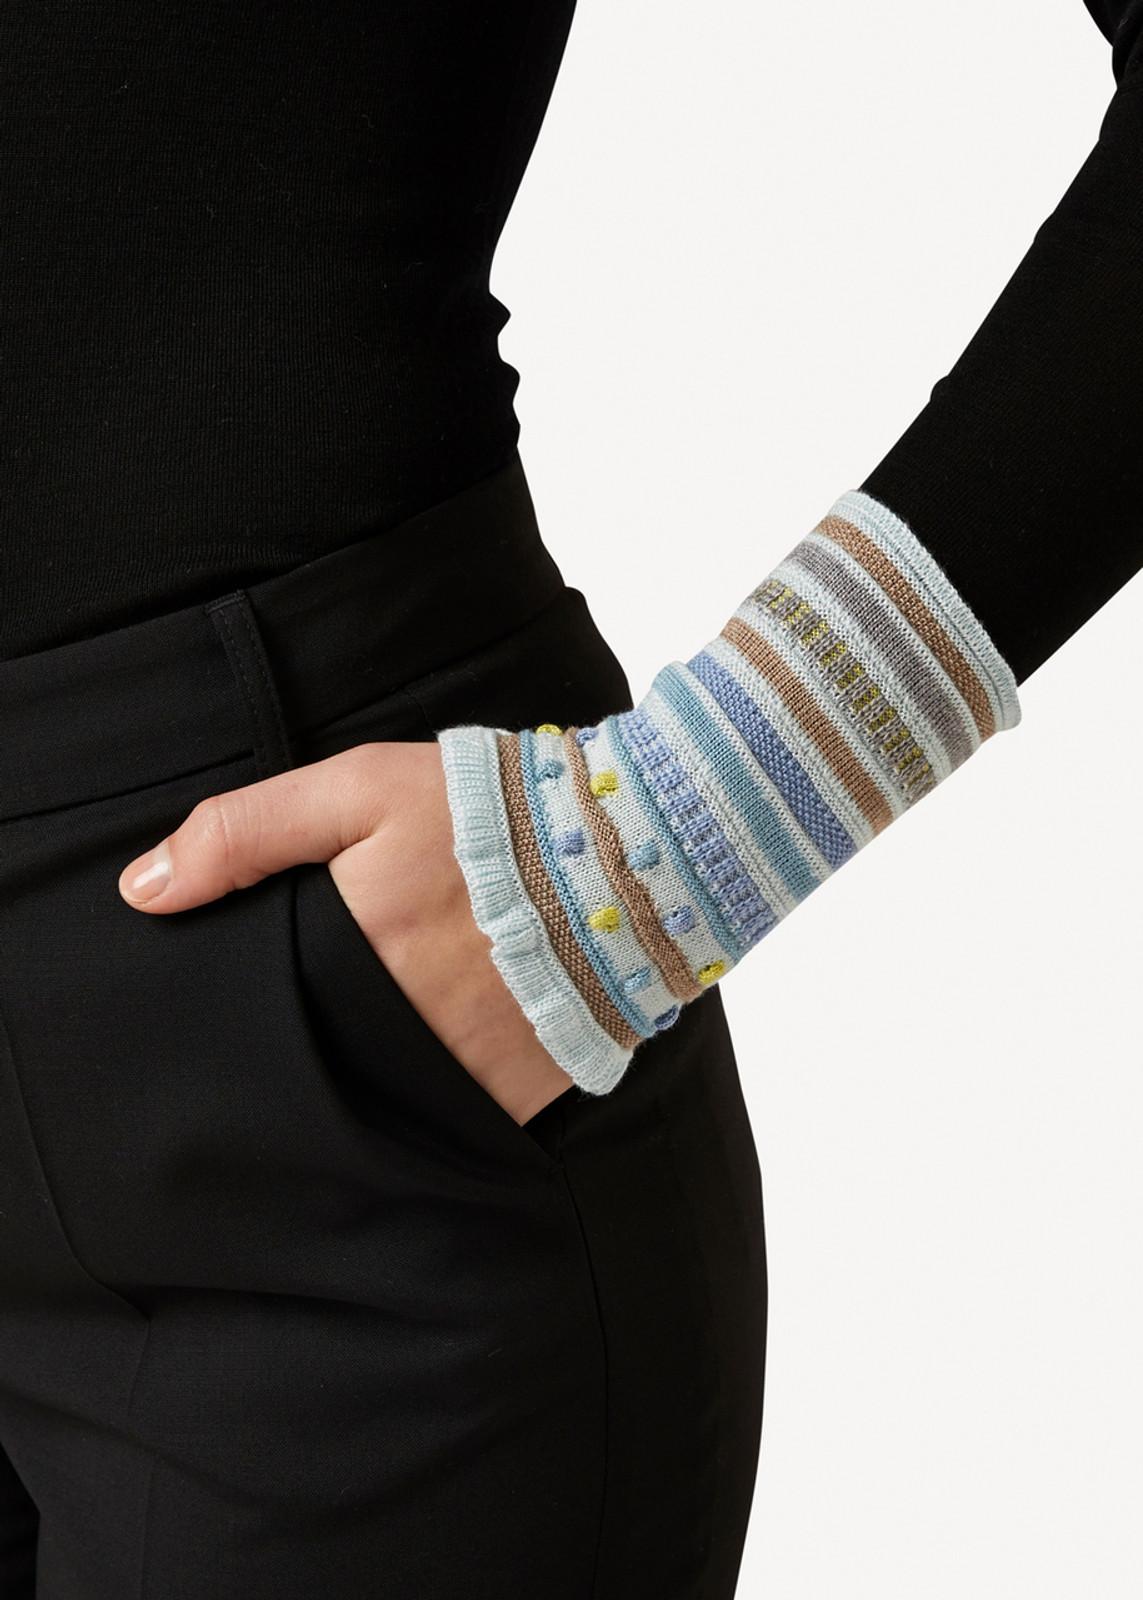 Amelia Oleana Popcorn and Stripe Wristlet, 347Q Light Blue